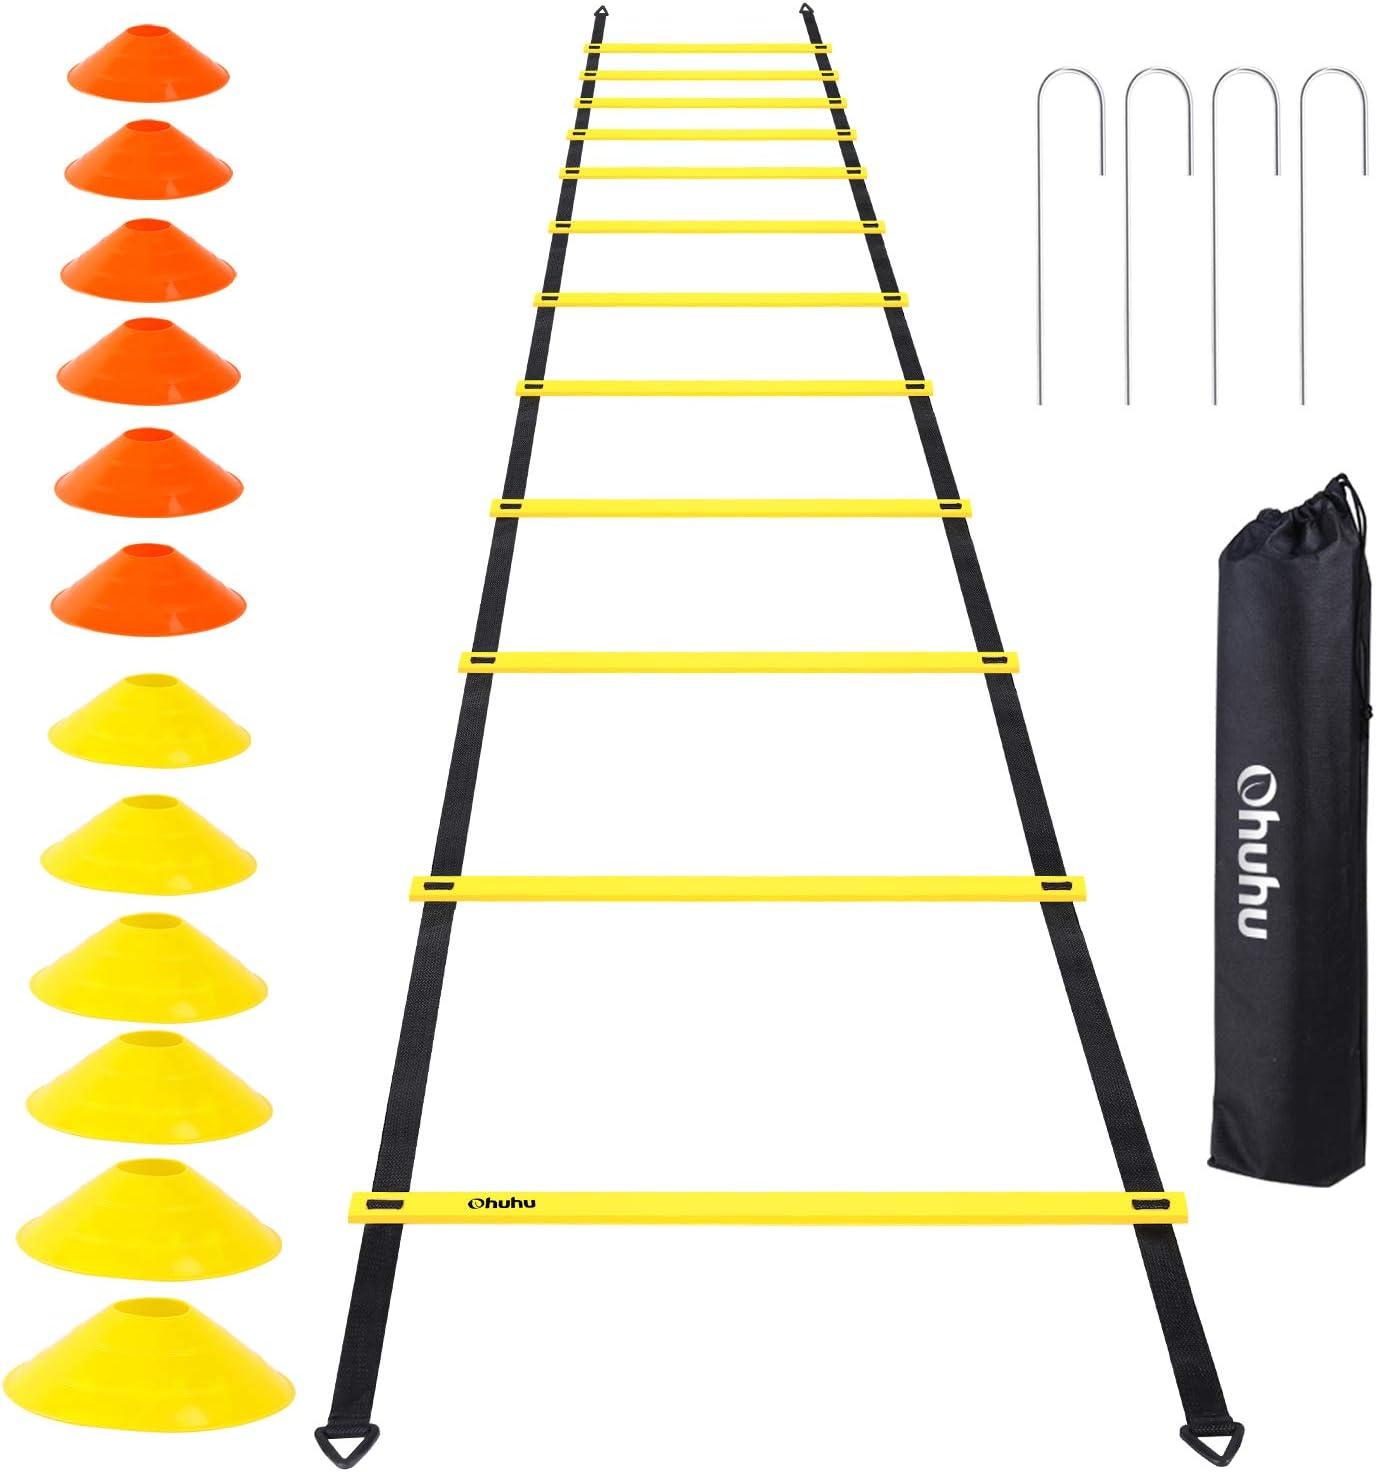 Genuine Ohuhu Speed Agility Ladder Training Set 20ft Rung Quantity limited L 12 -